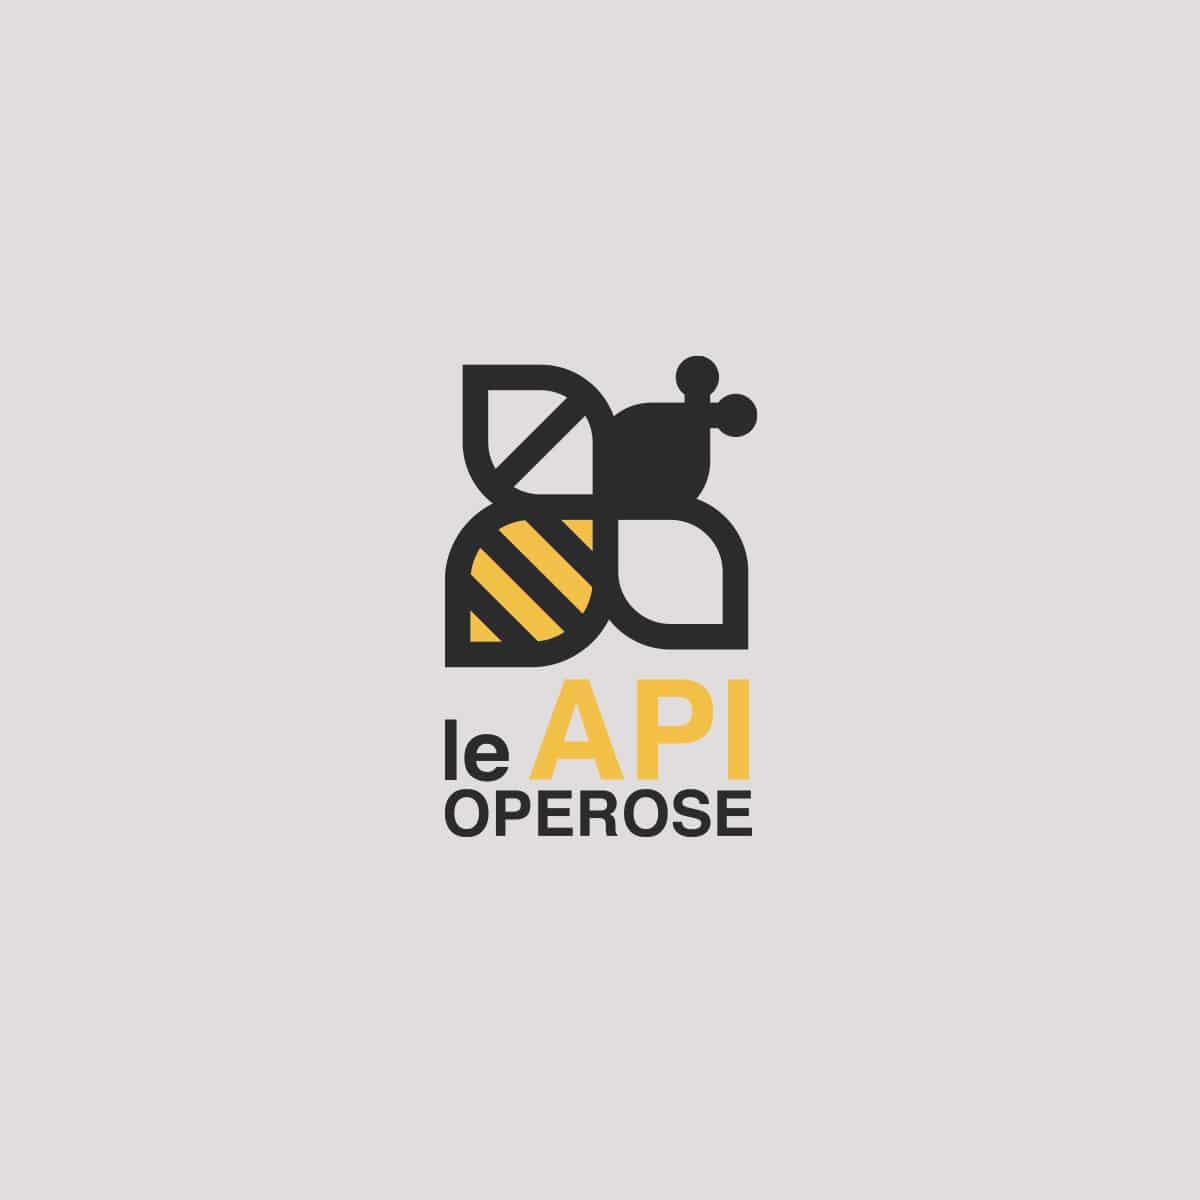 api operose grafica etichette rieti creazione logo rieti grafica rieti packaging rieti constant design rieti